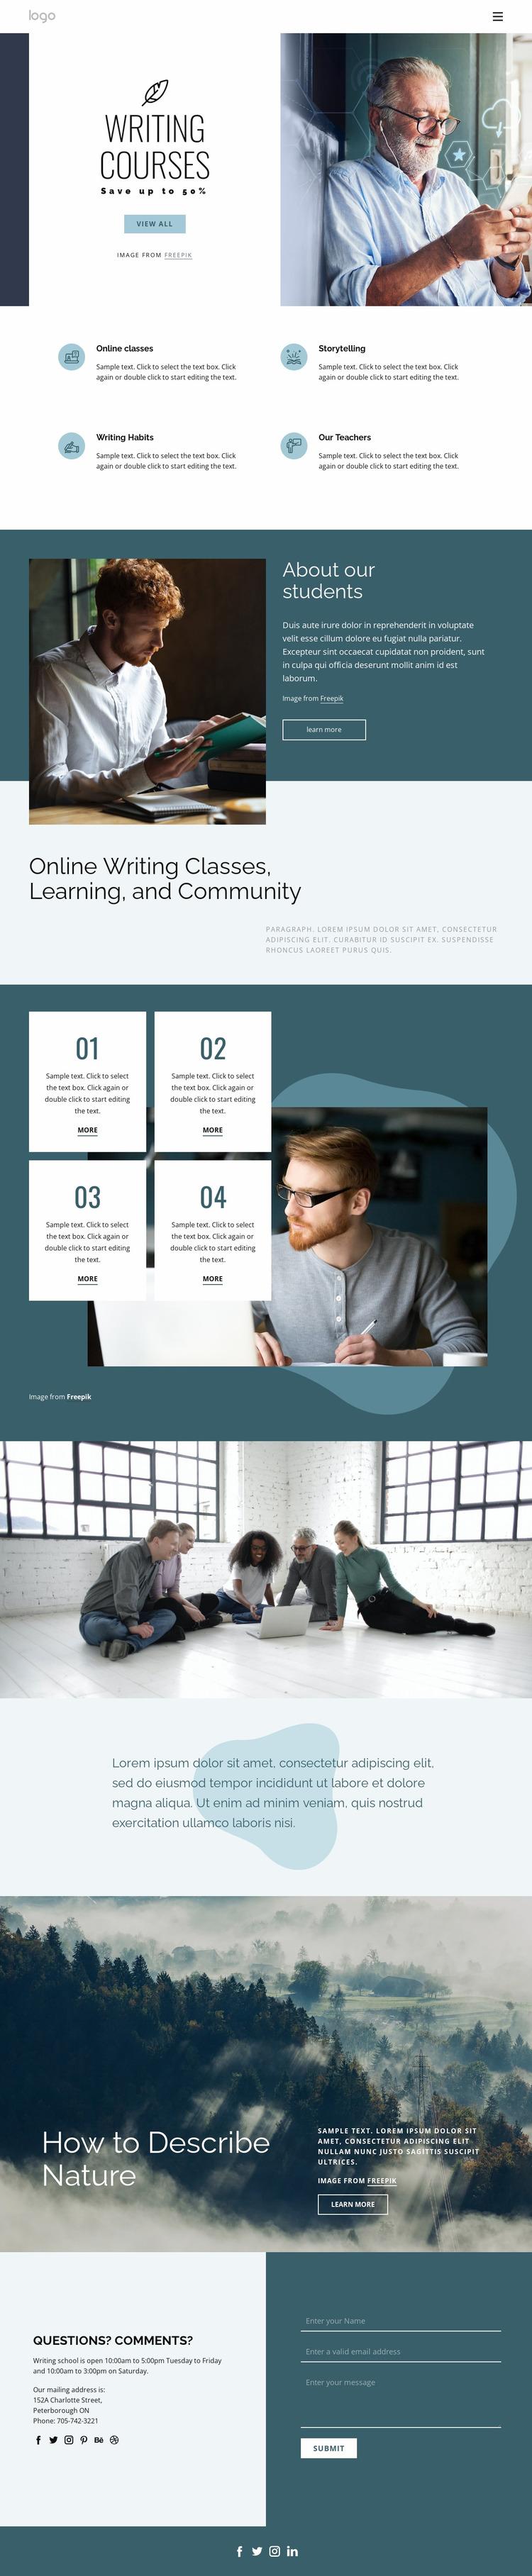 Creative writing courses Website Mockup